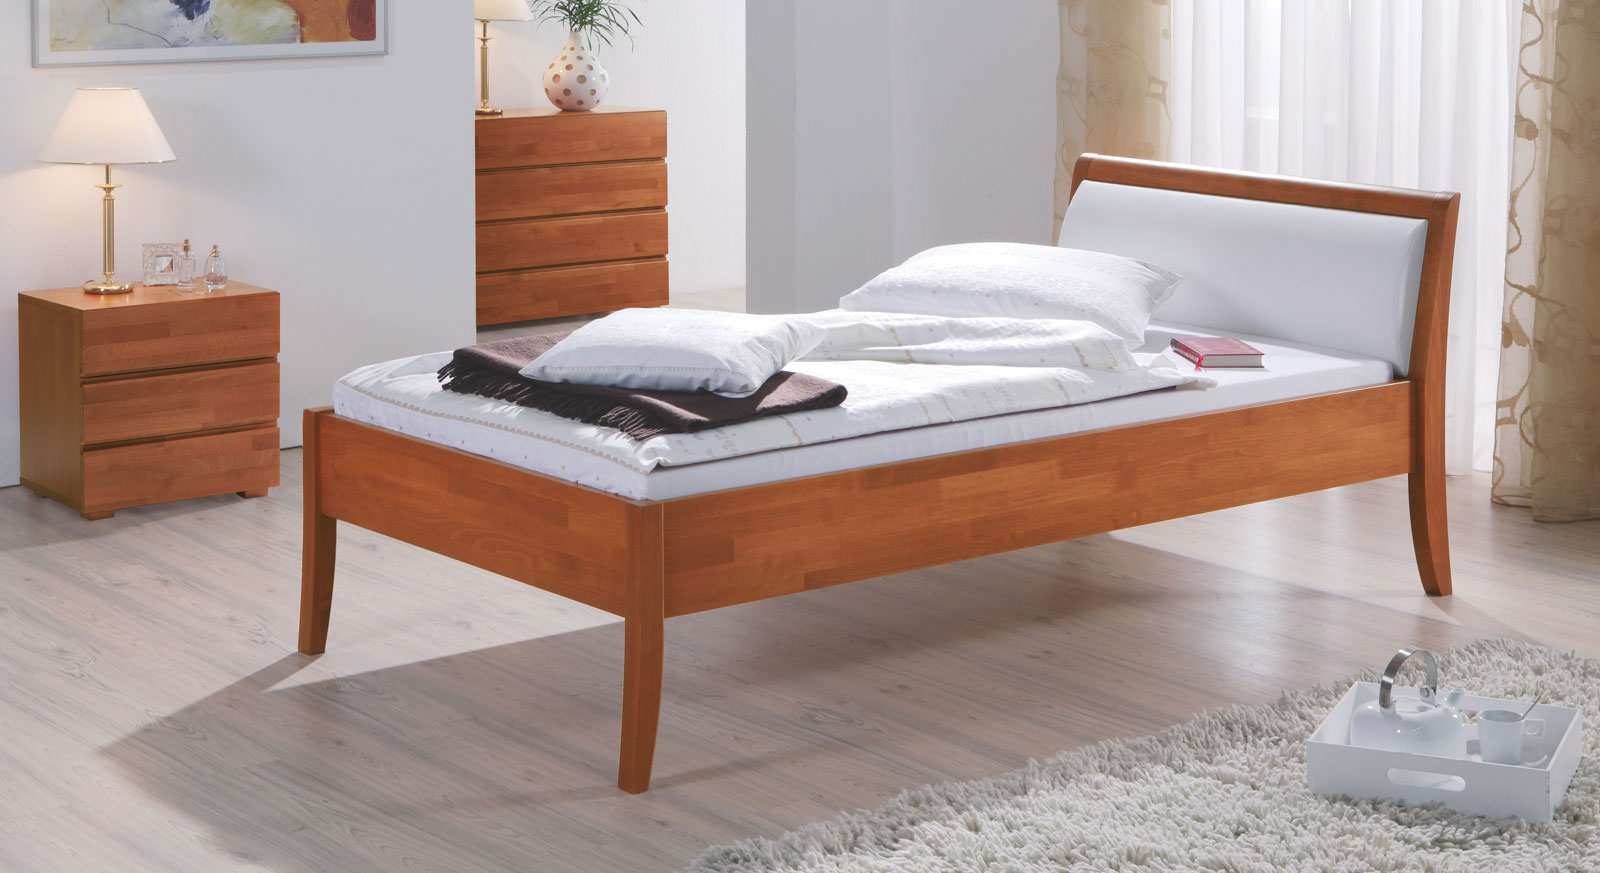 betten mit hoher rckwand cool beautiful affordable polsterbett mit bettkasten x cool. Black Bedroom Furniture Sets. Home Design Ideas